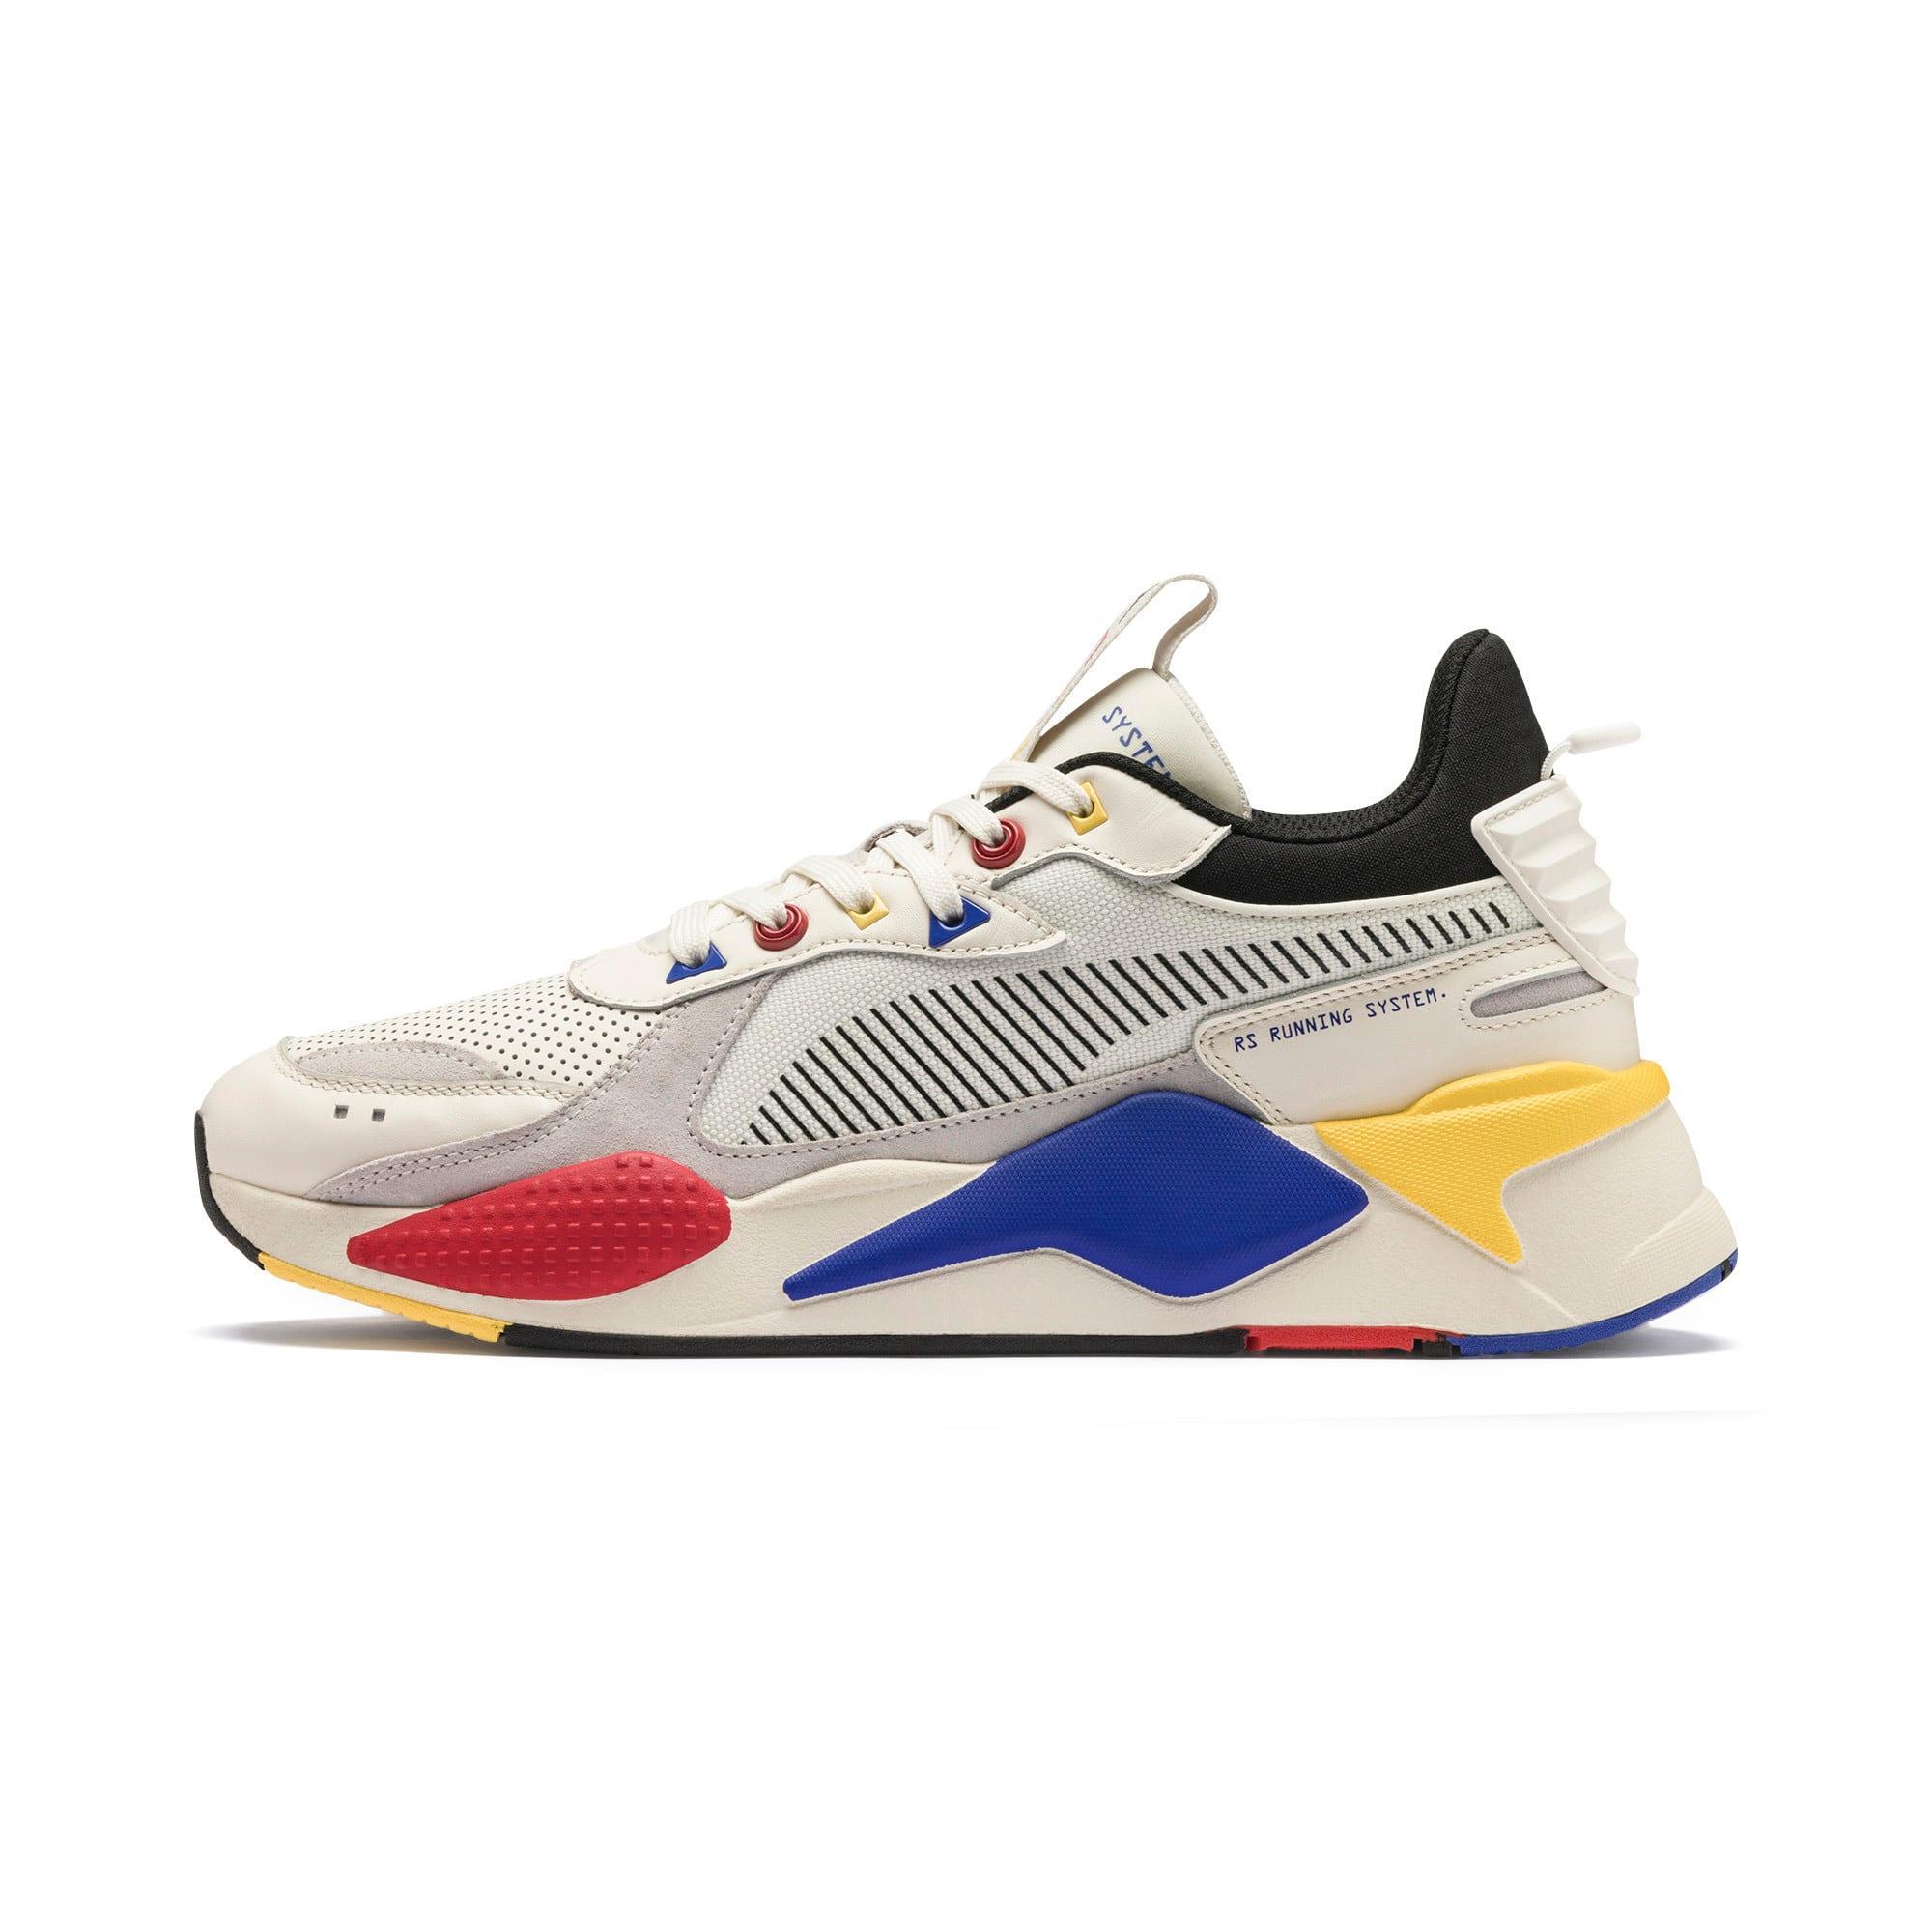 Thumbnail 1 of RS-X Colour Theory Sneaker, Whisper White-Puma Black, medium